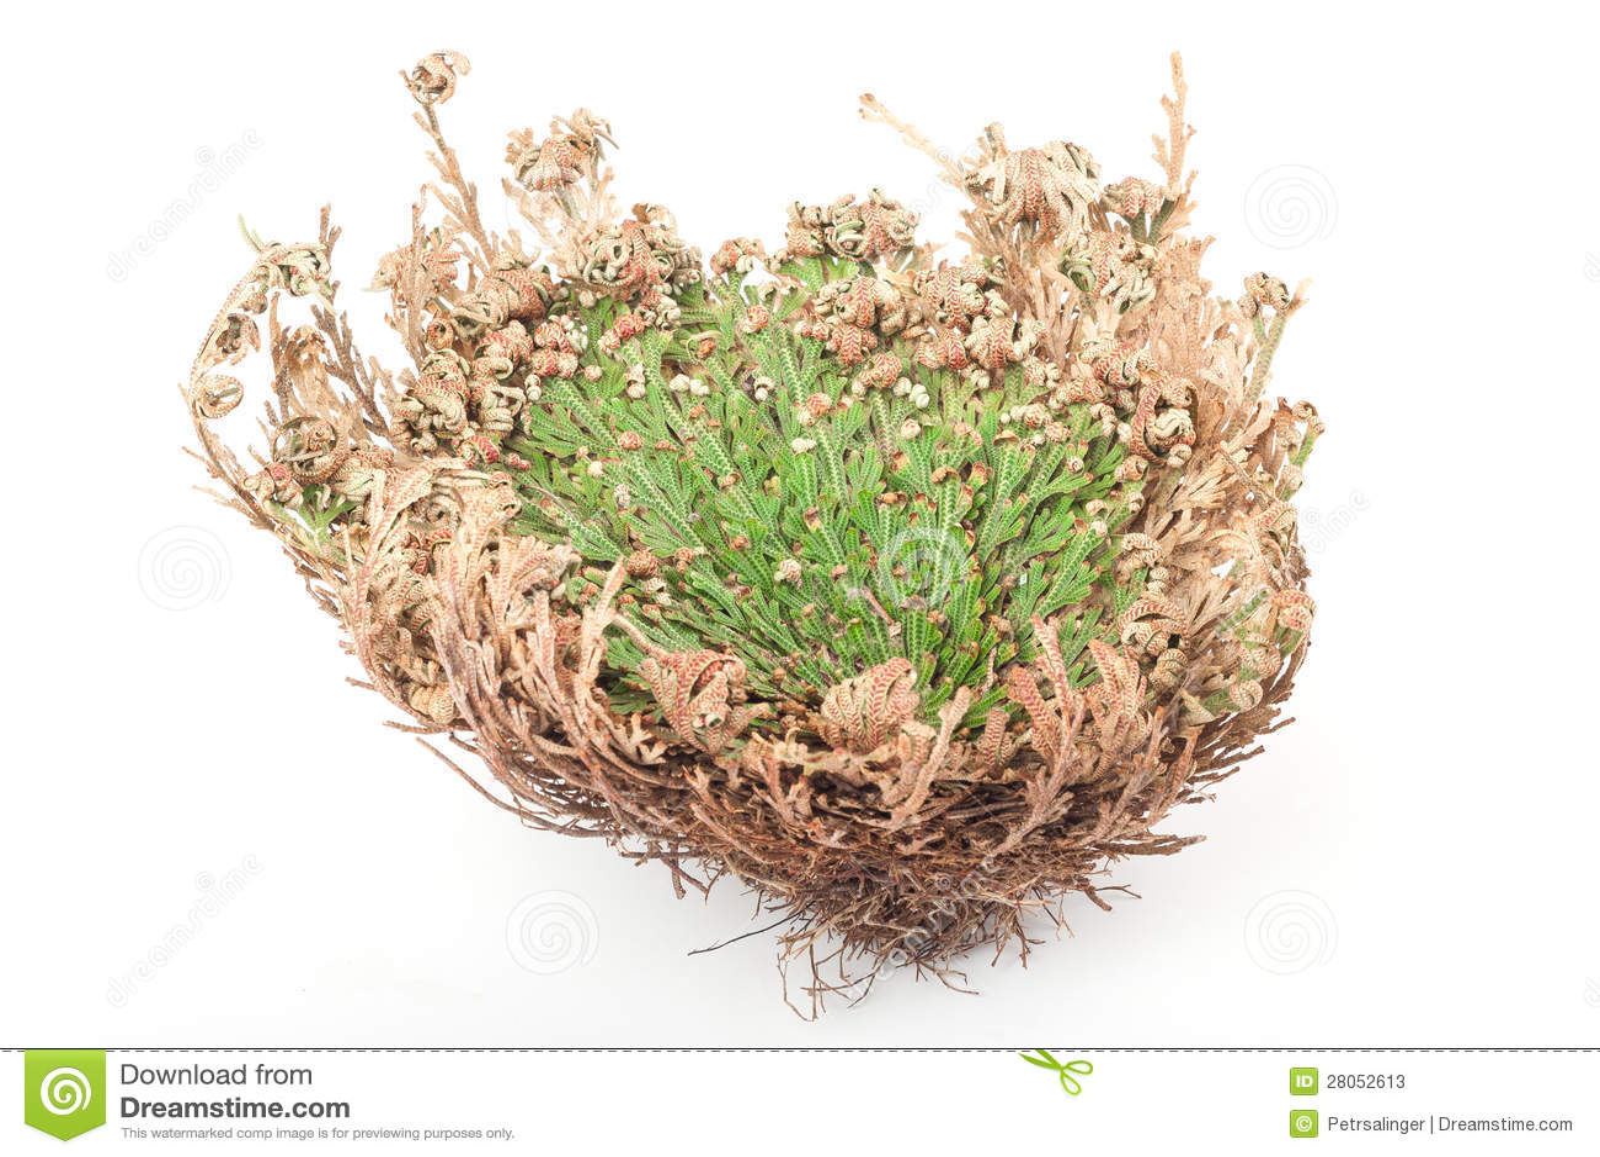 rose of jericho stock image image of dried curing botany 28052613. Black Bedroom Furniture Sets. Home Design Ideas